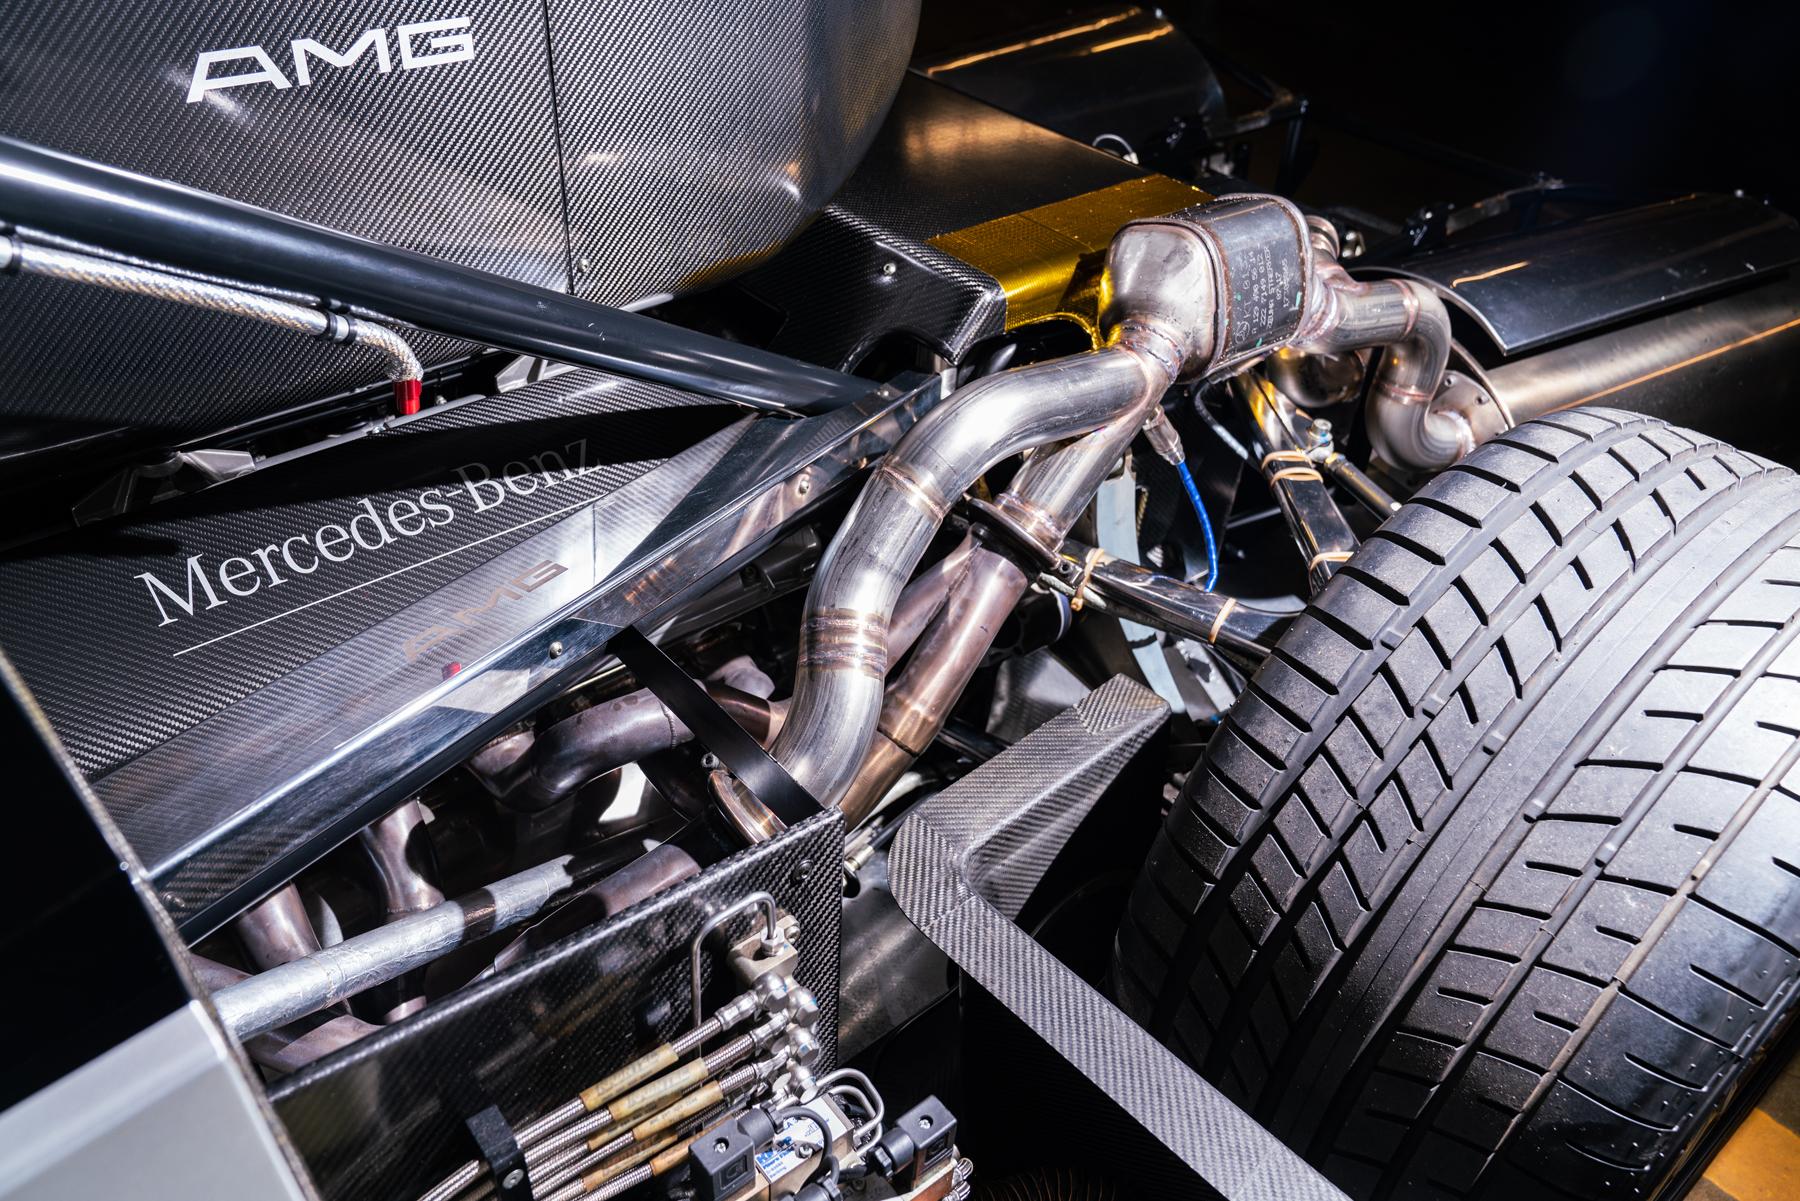 1998 Mercedes-Benz AMG CLK GTR engine exhaust detail